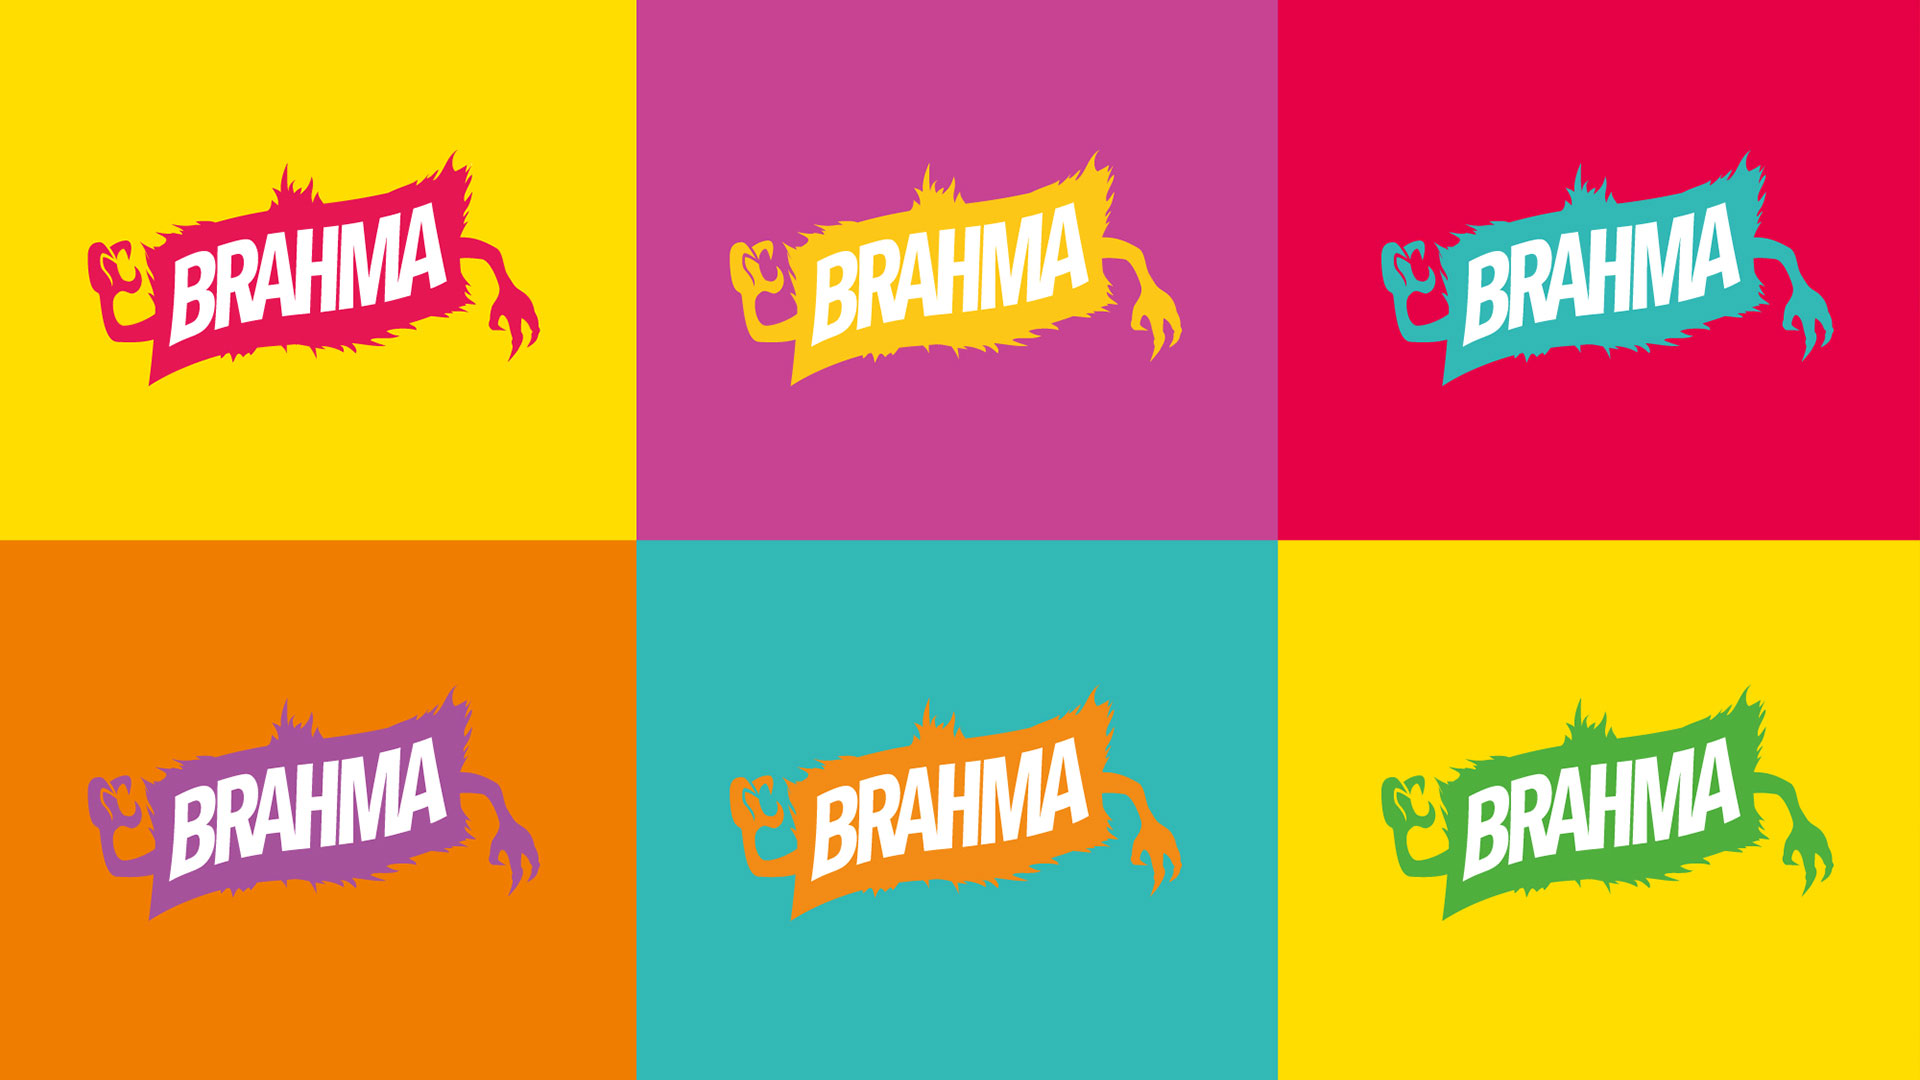 BRAHMA_07